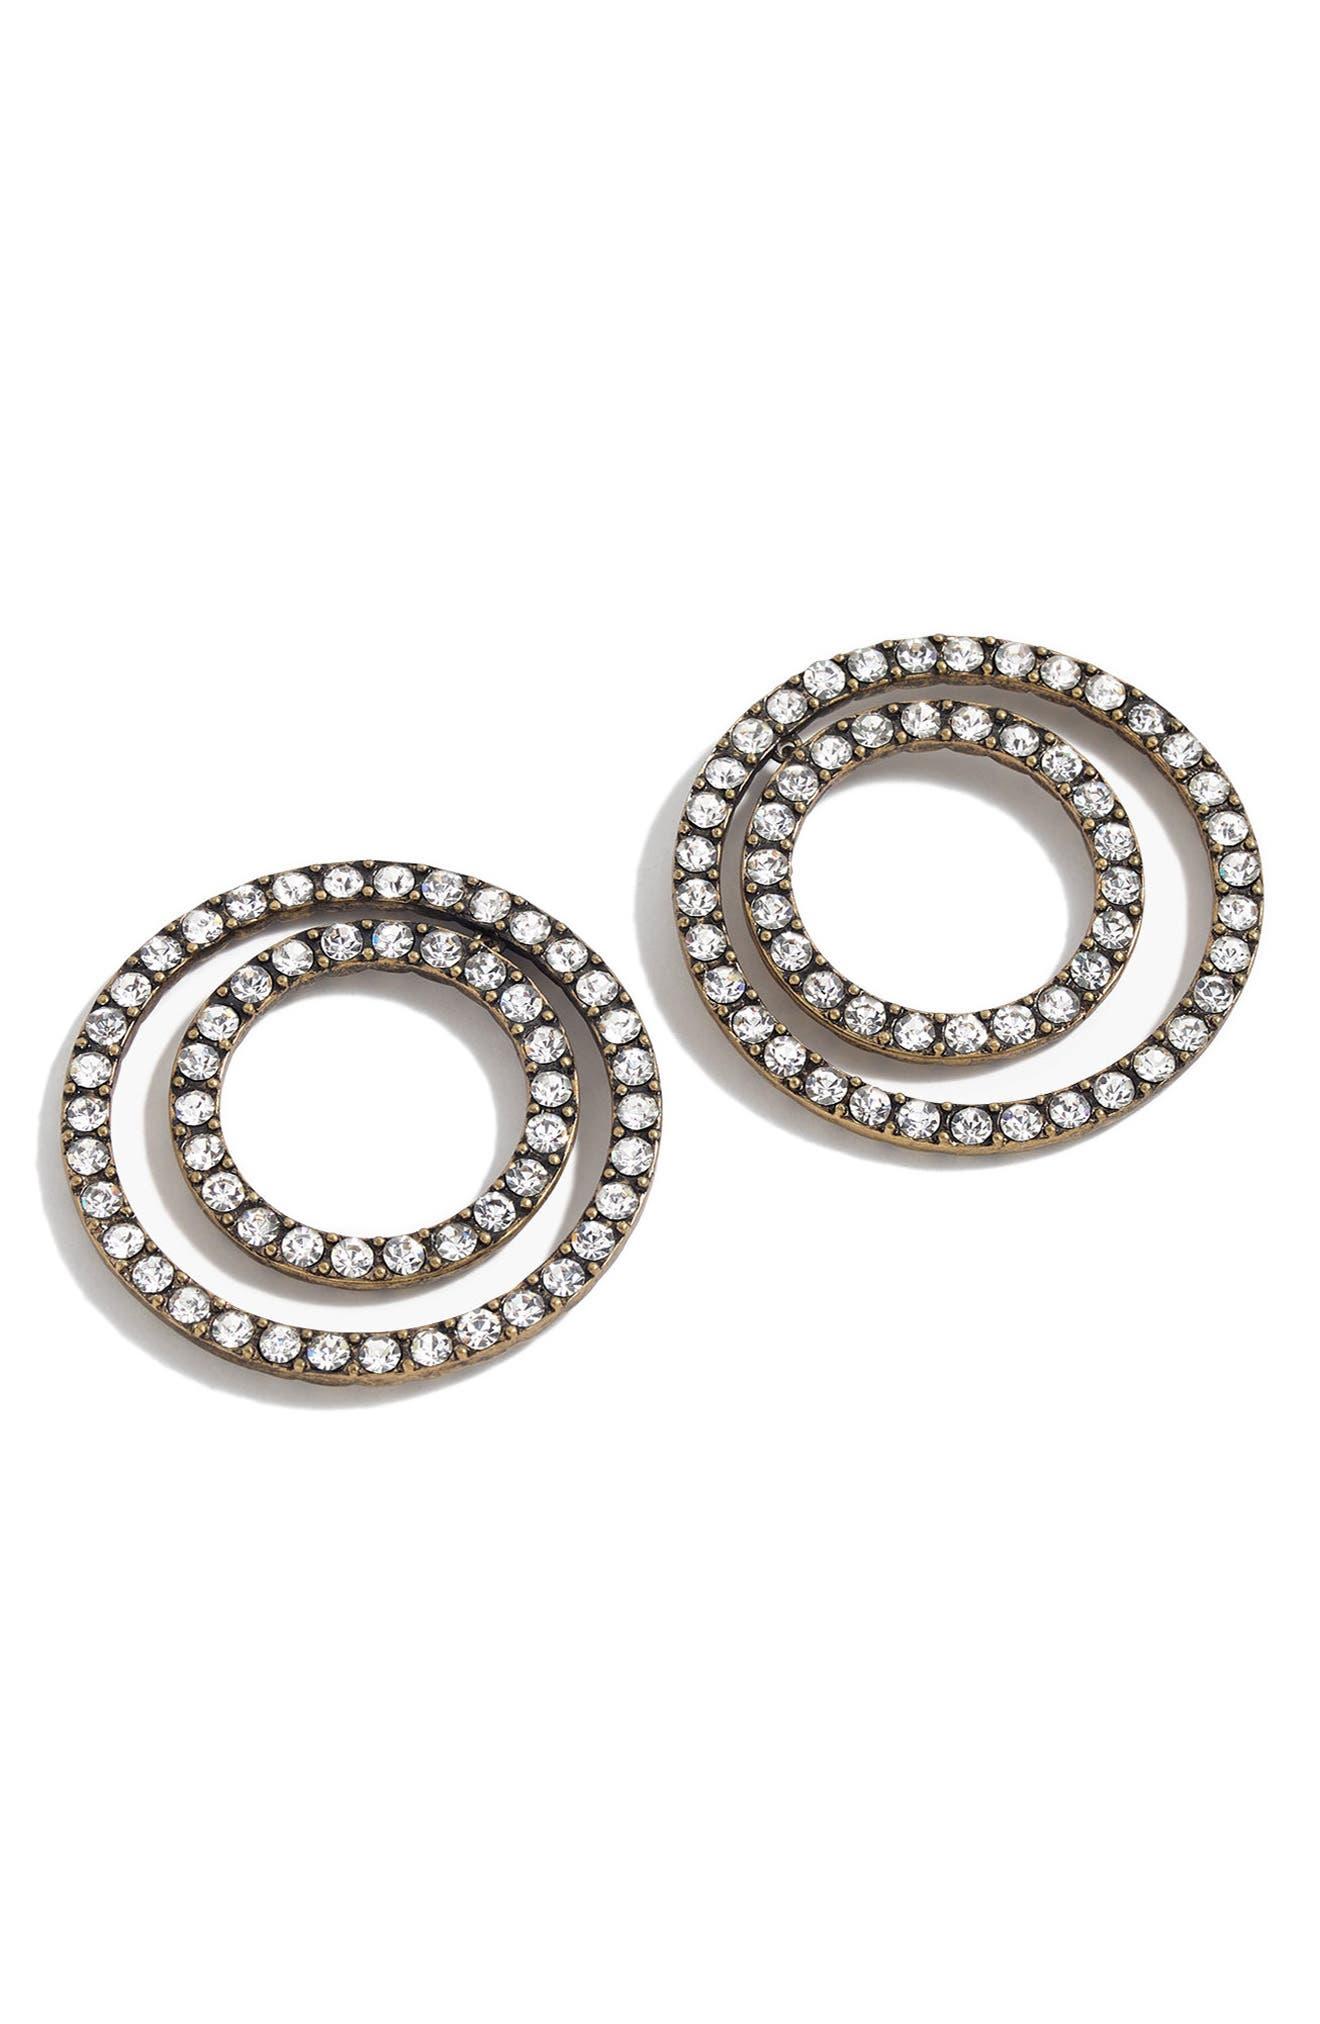 J.Crew Sparkle Double Circle Earrings,                             Main thumbnail 1, color,                             Heather Ash